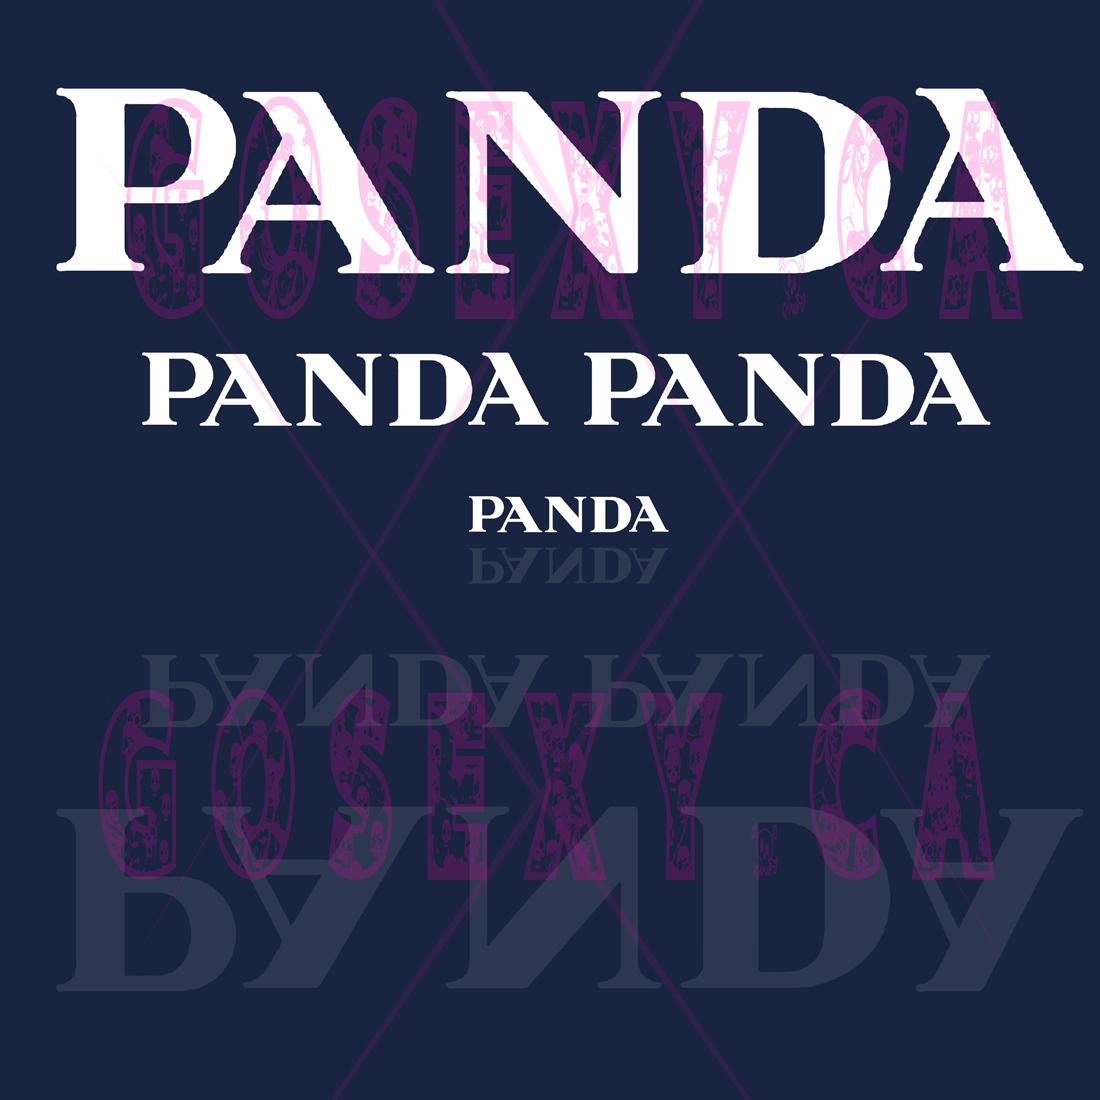 https://0901.nccdn.net/4_2/000/000/046/6ea/panda-prada-gosexyca.png